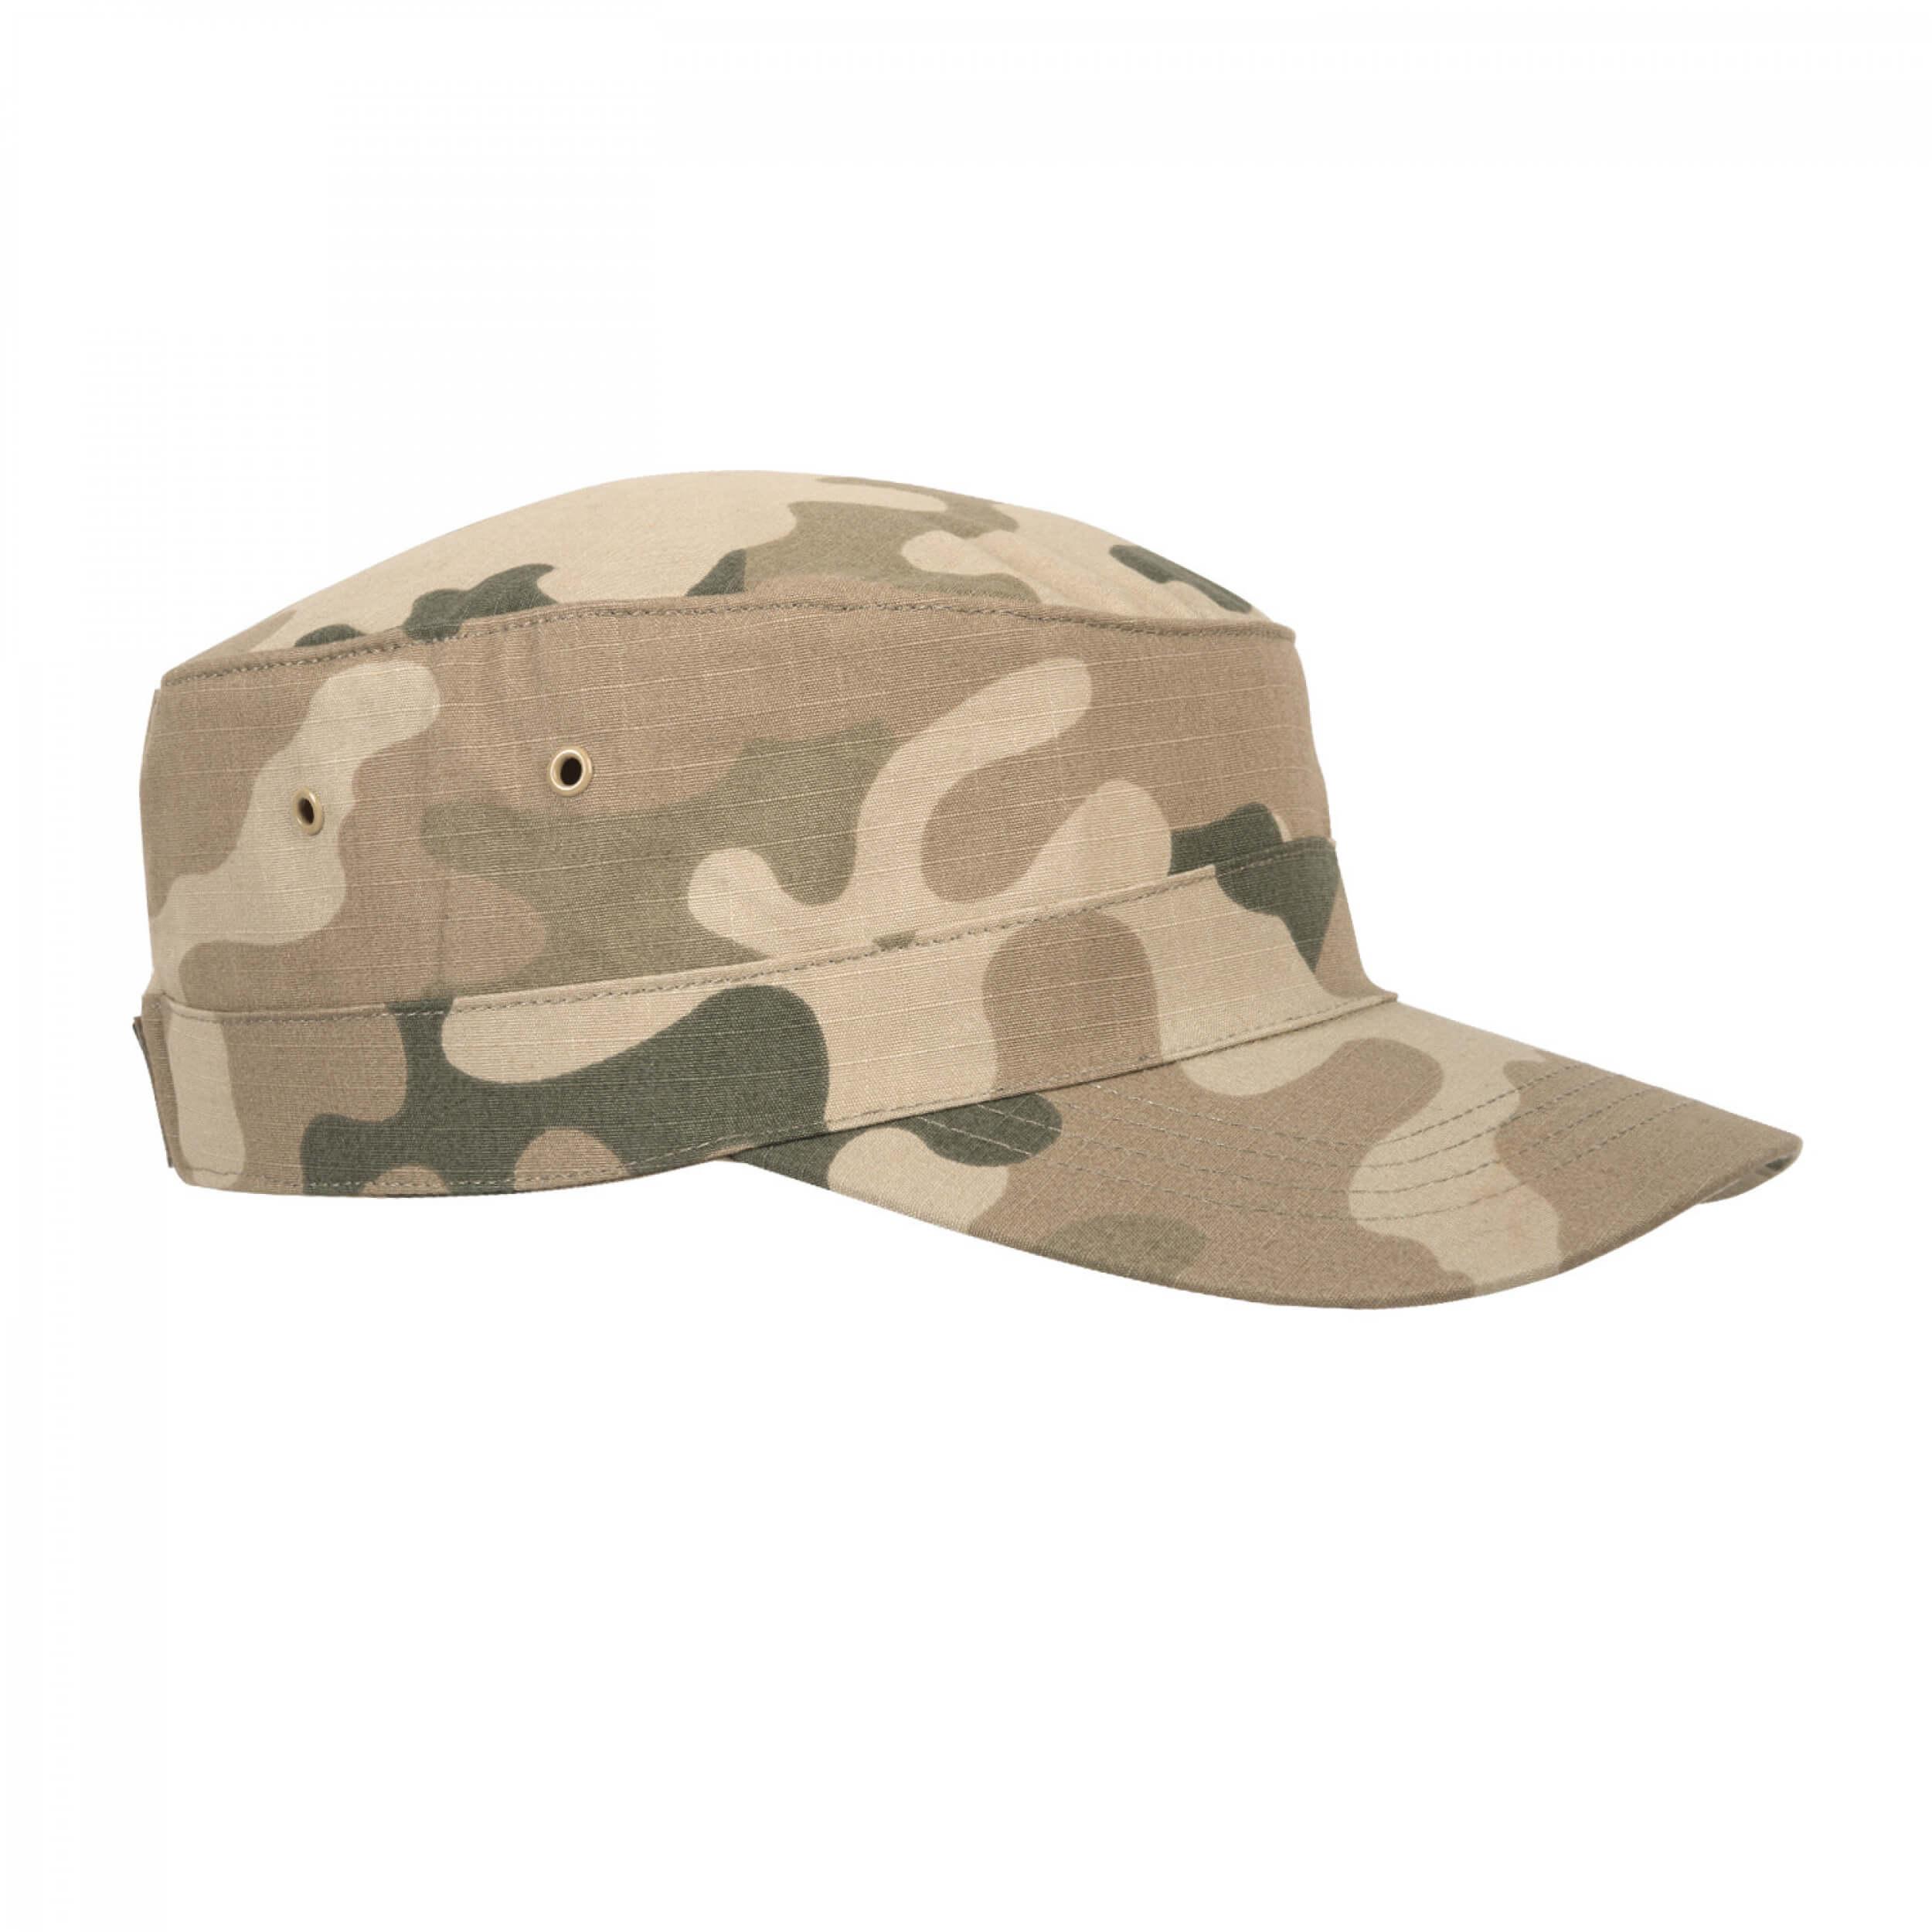 Helikon-Tex Combat Cap - Cotton Ripstop - PL Desert